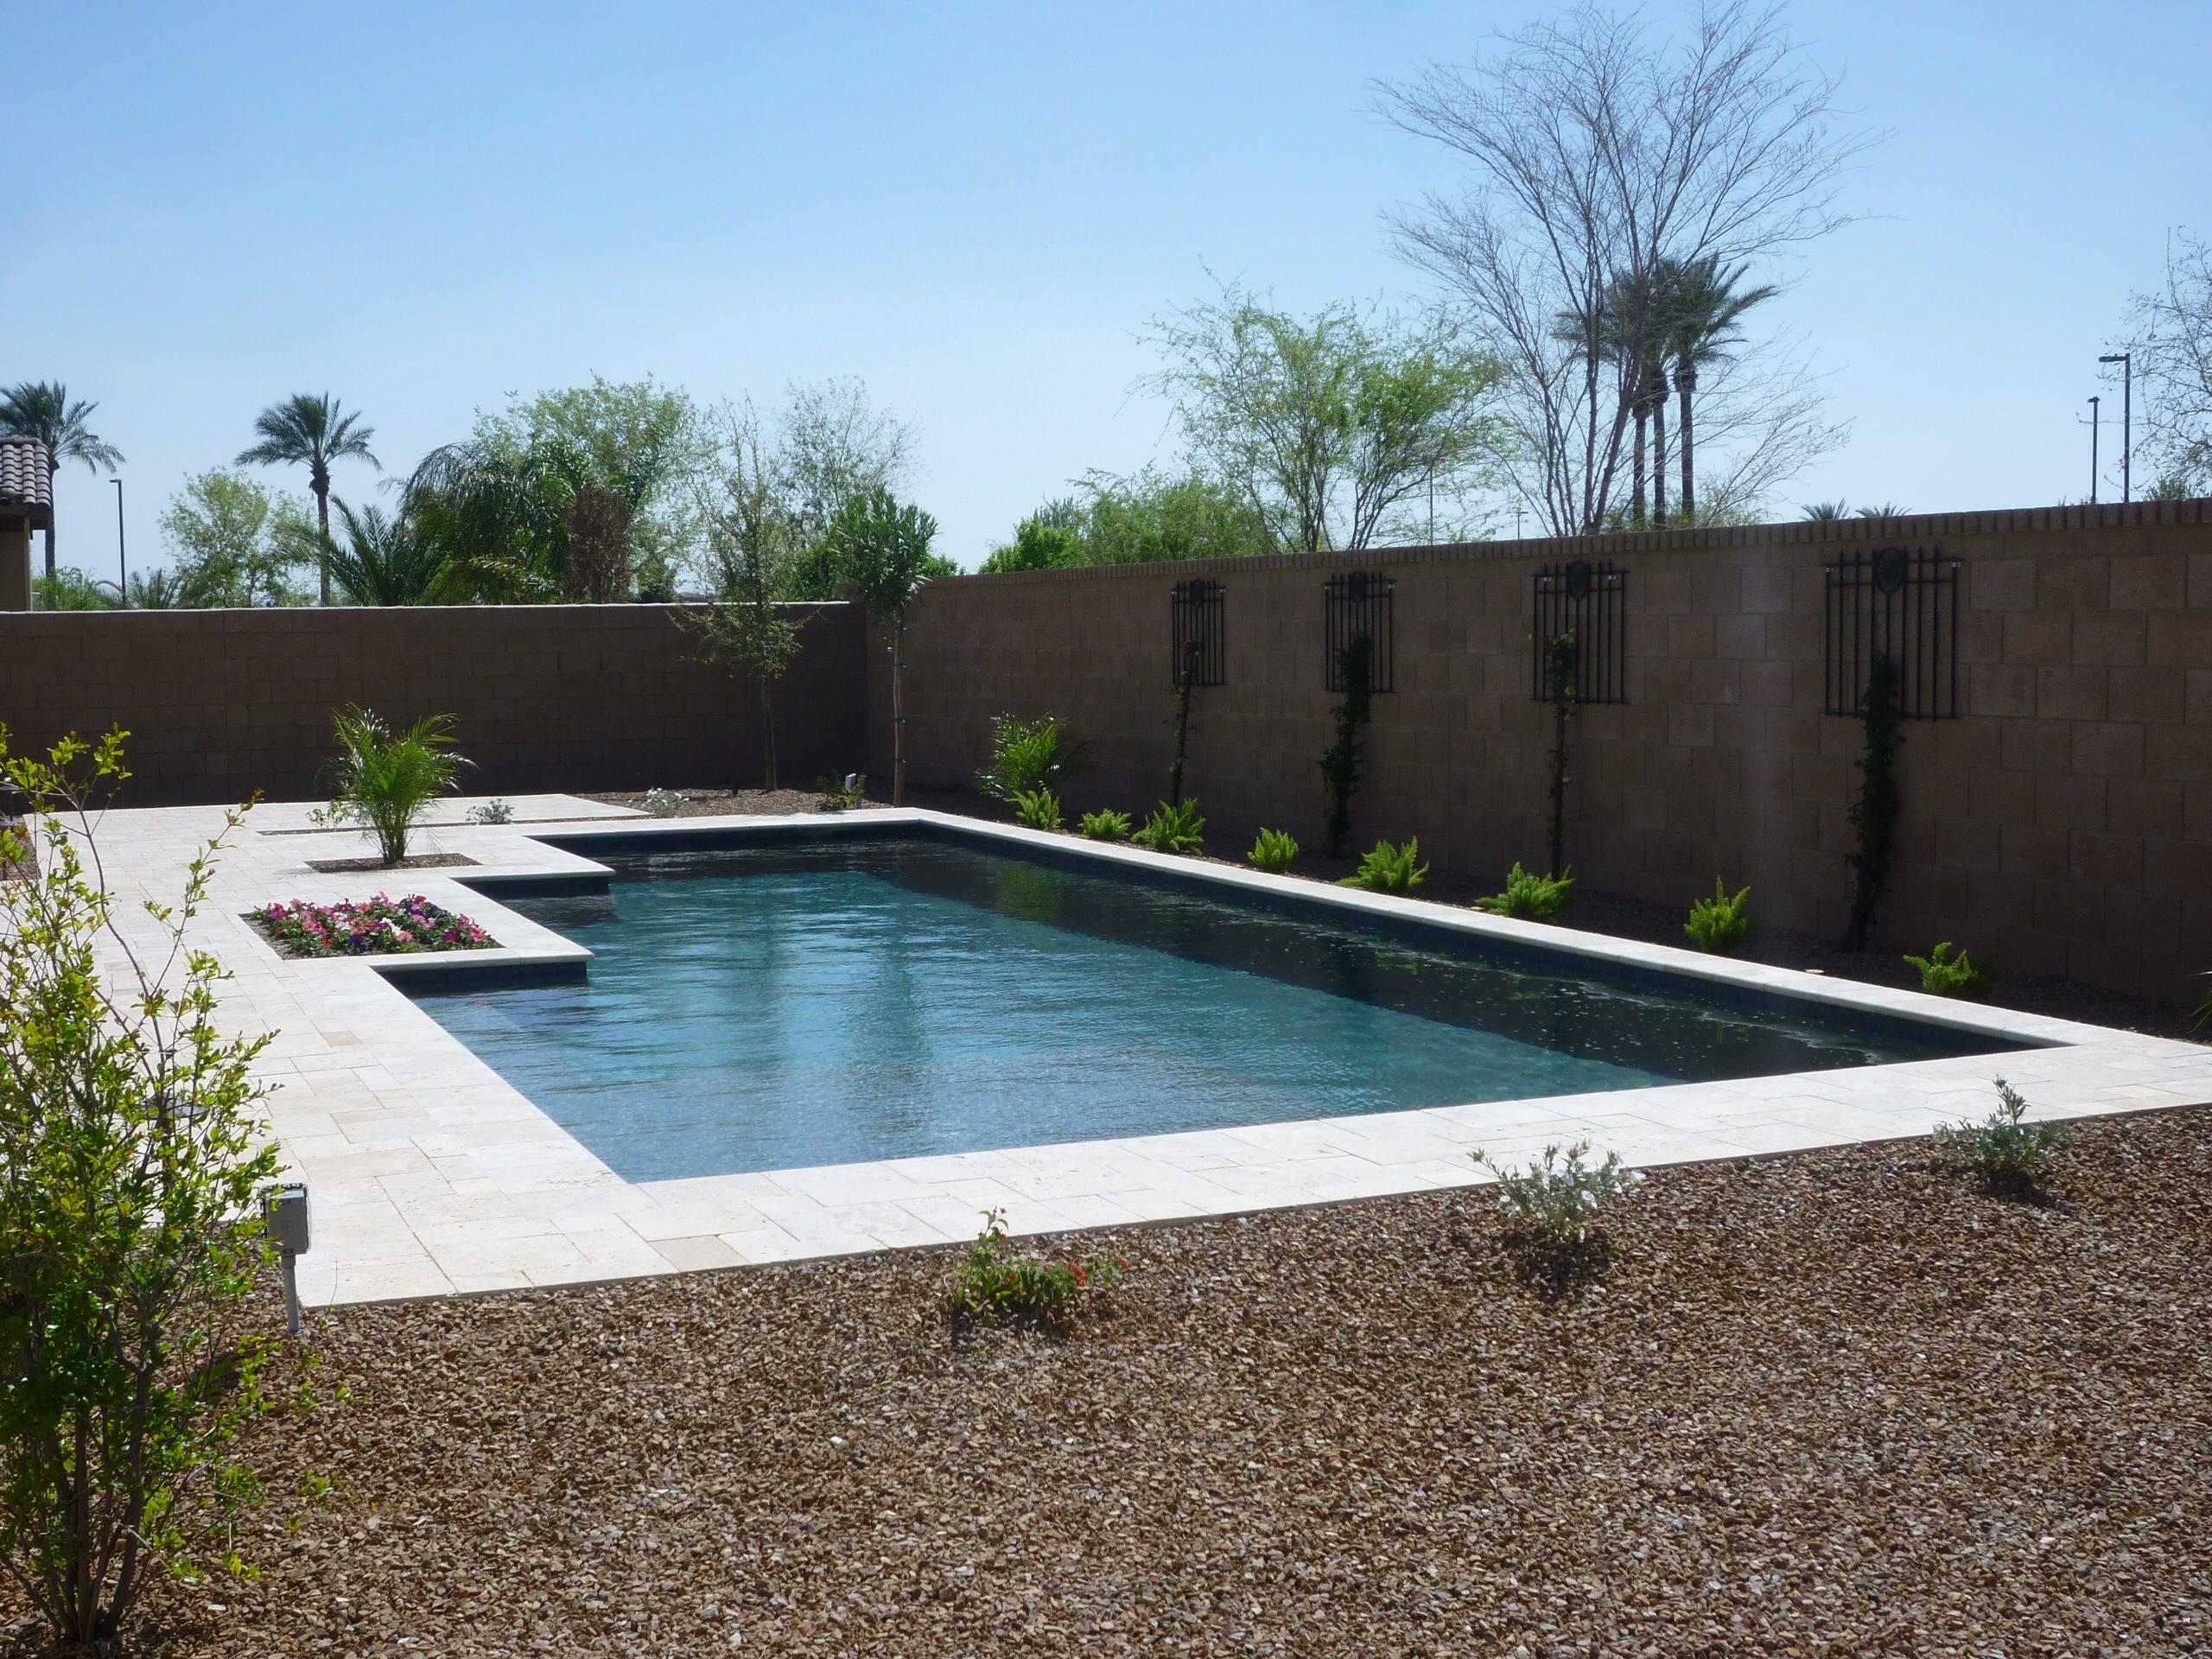 Pool with Travertine Deck & Landscape